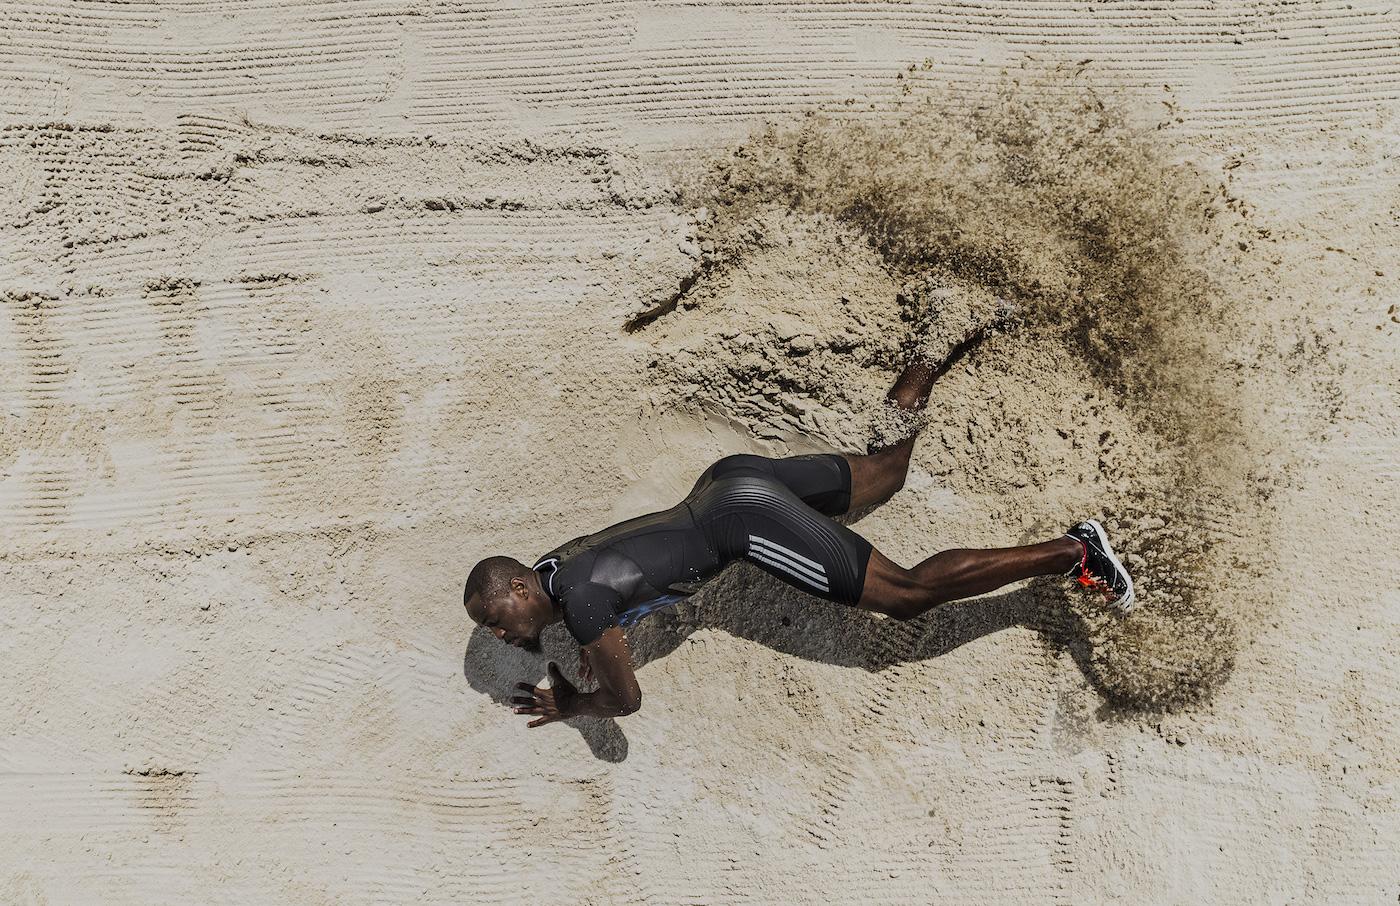 RAFAELASTORGA_TEDDY_TAMGHO_IAAF215_0314.jpg